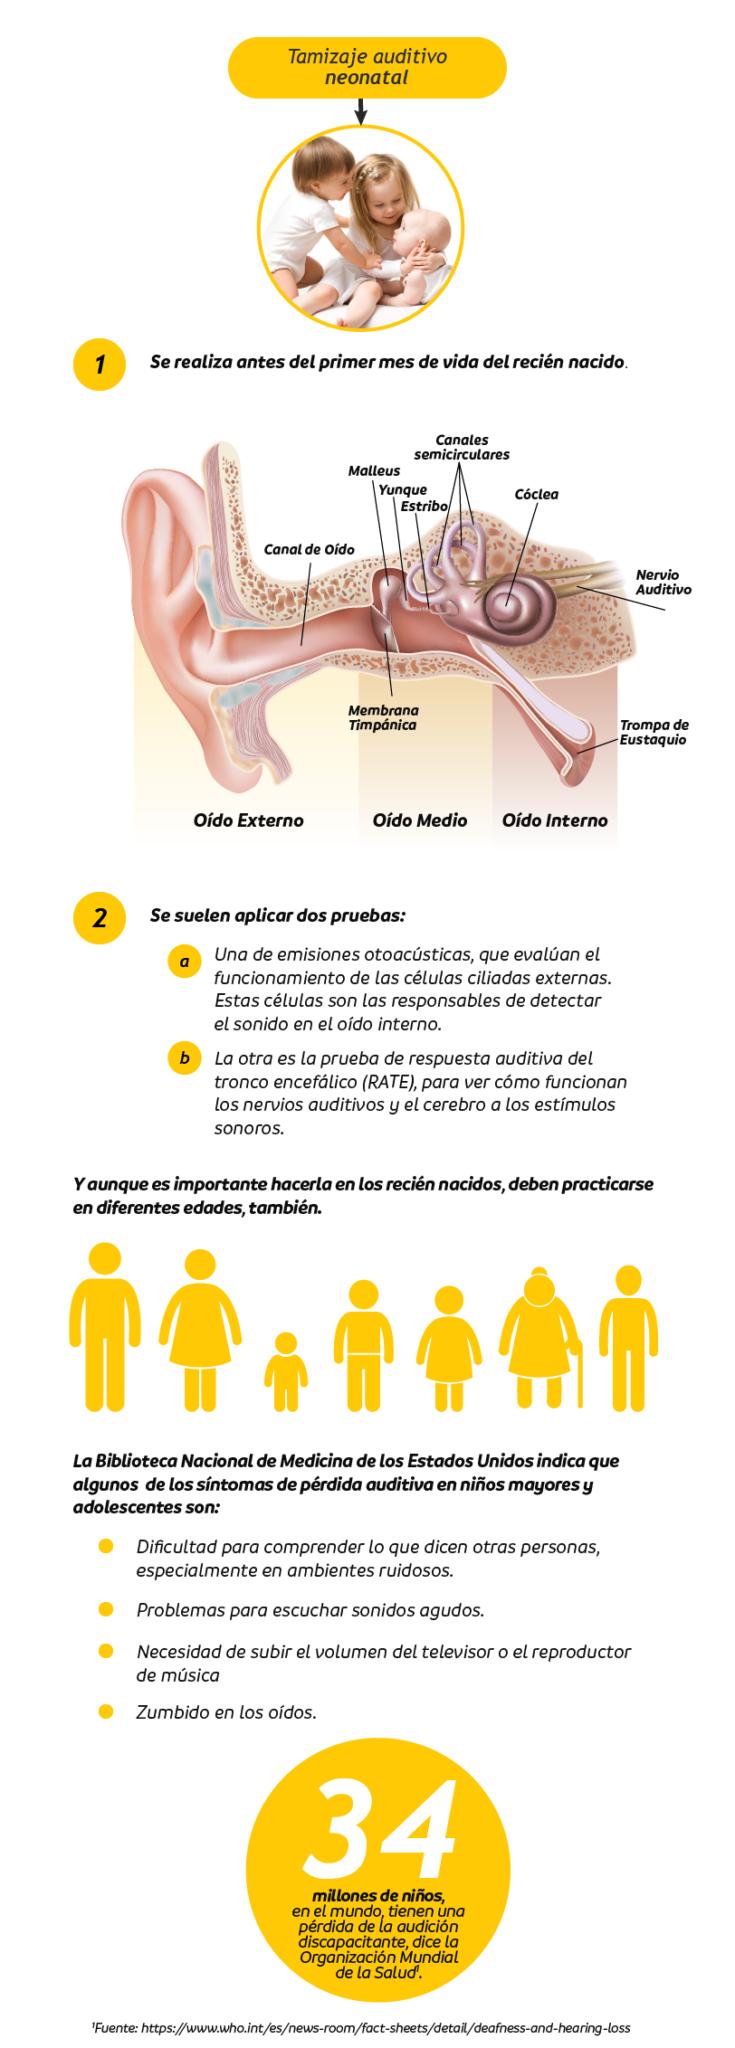 Tamizaje auditivo